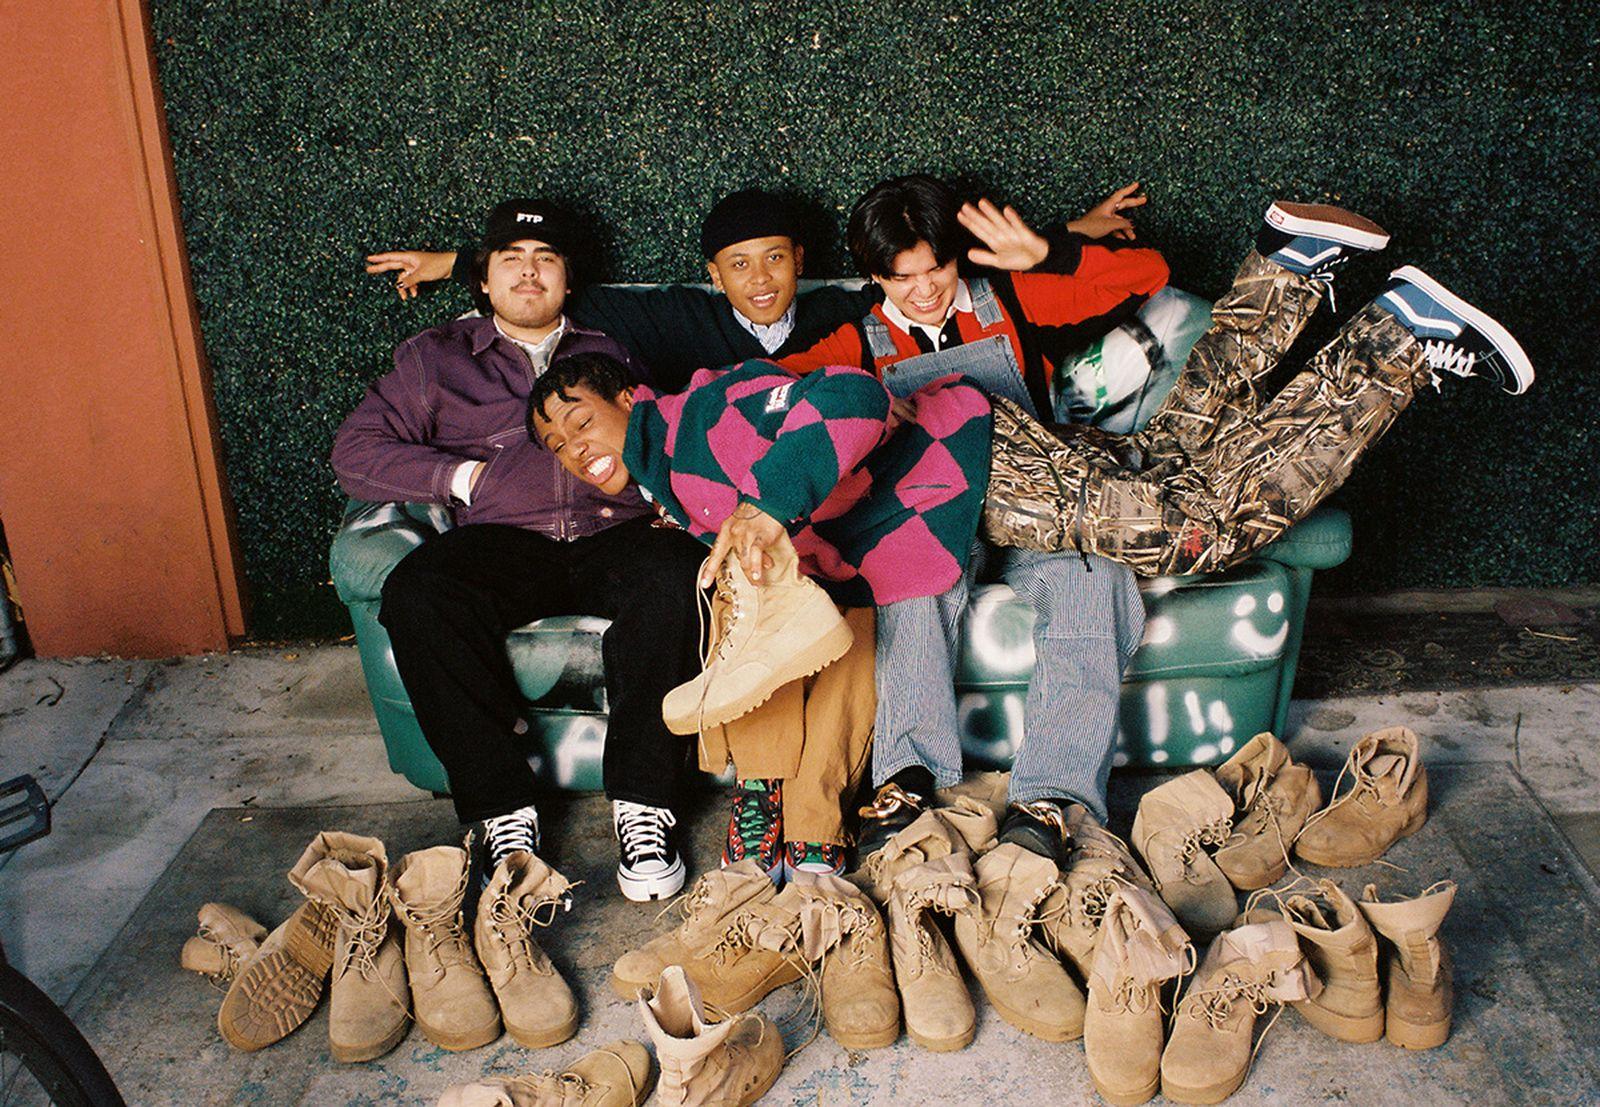 Look 2, L-R, Manny, Baby, Ivan, Jody